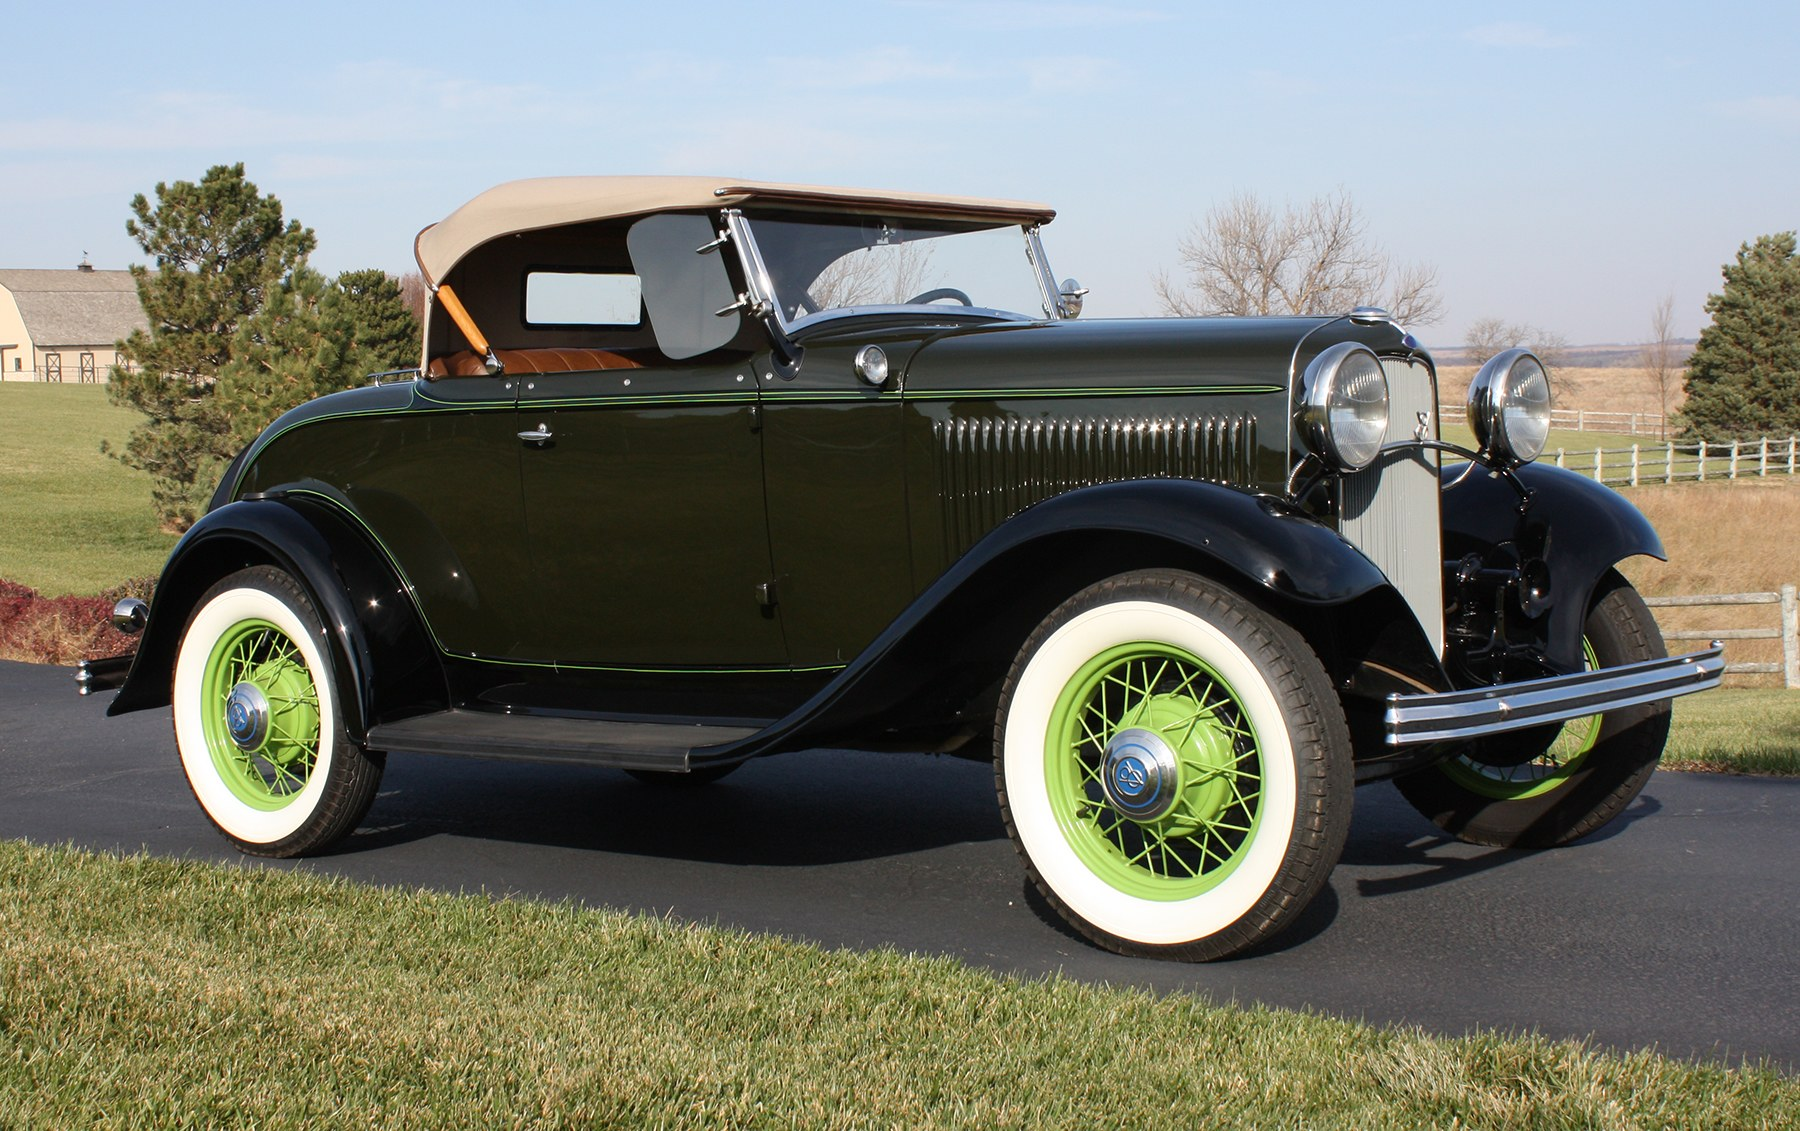 1932 Ford Model 18 V-8 Deluxe Roadster